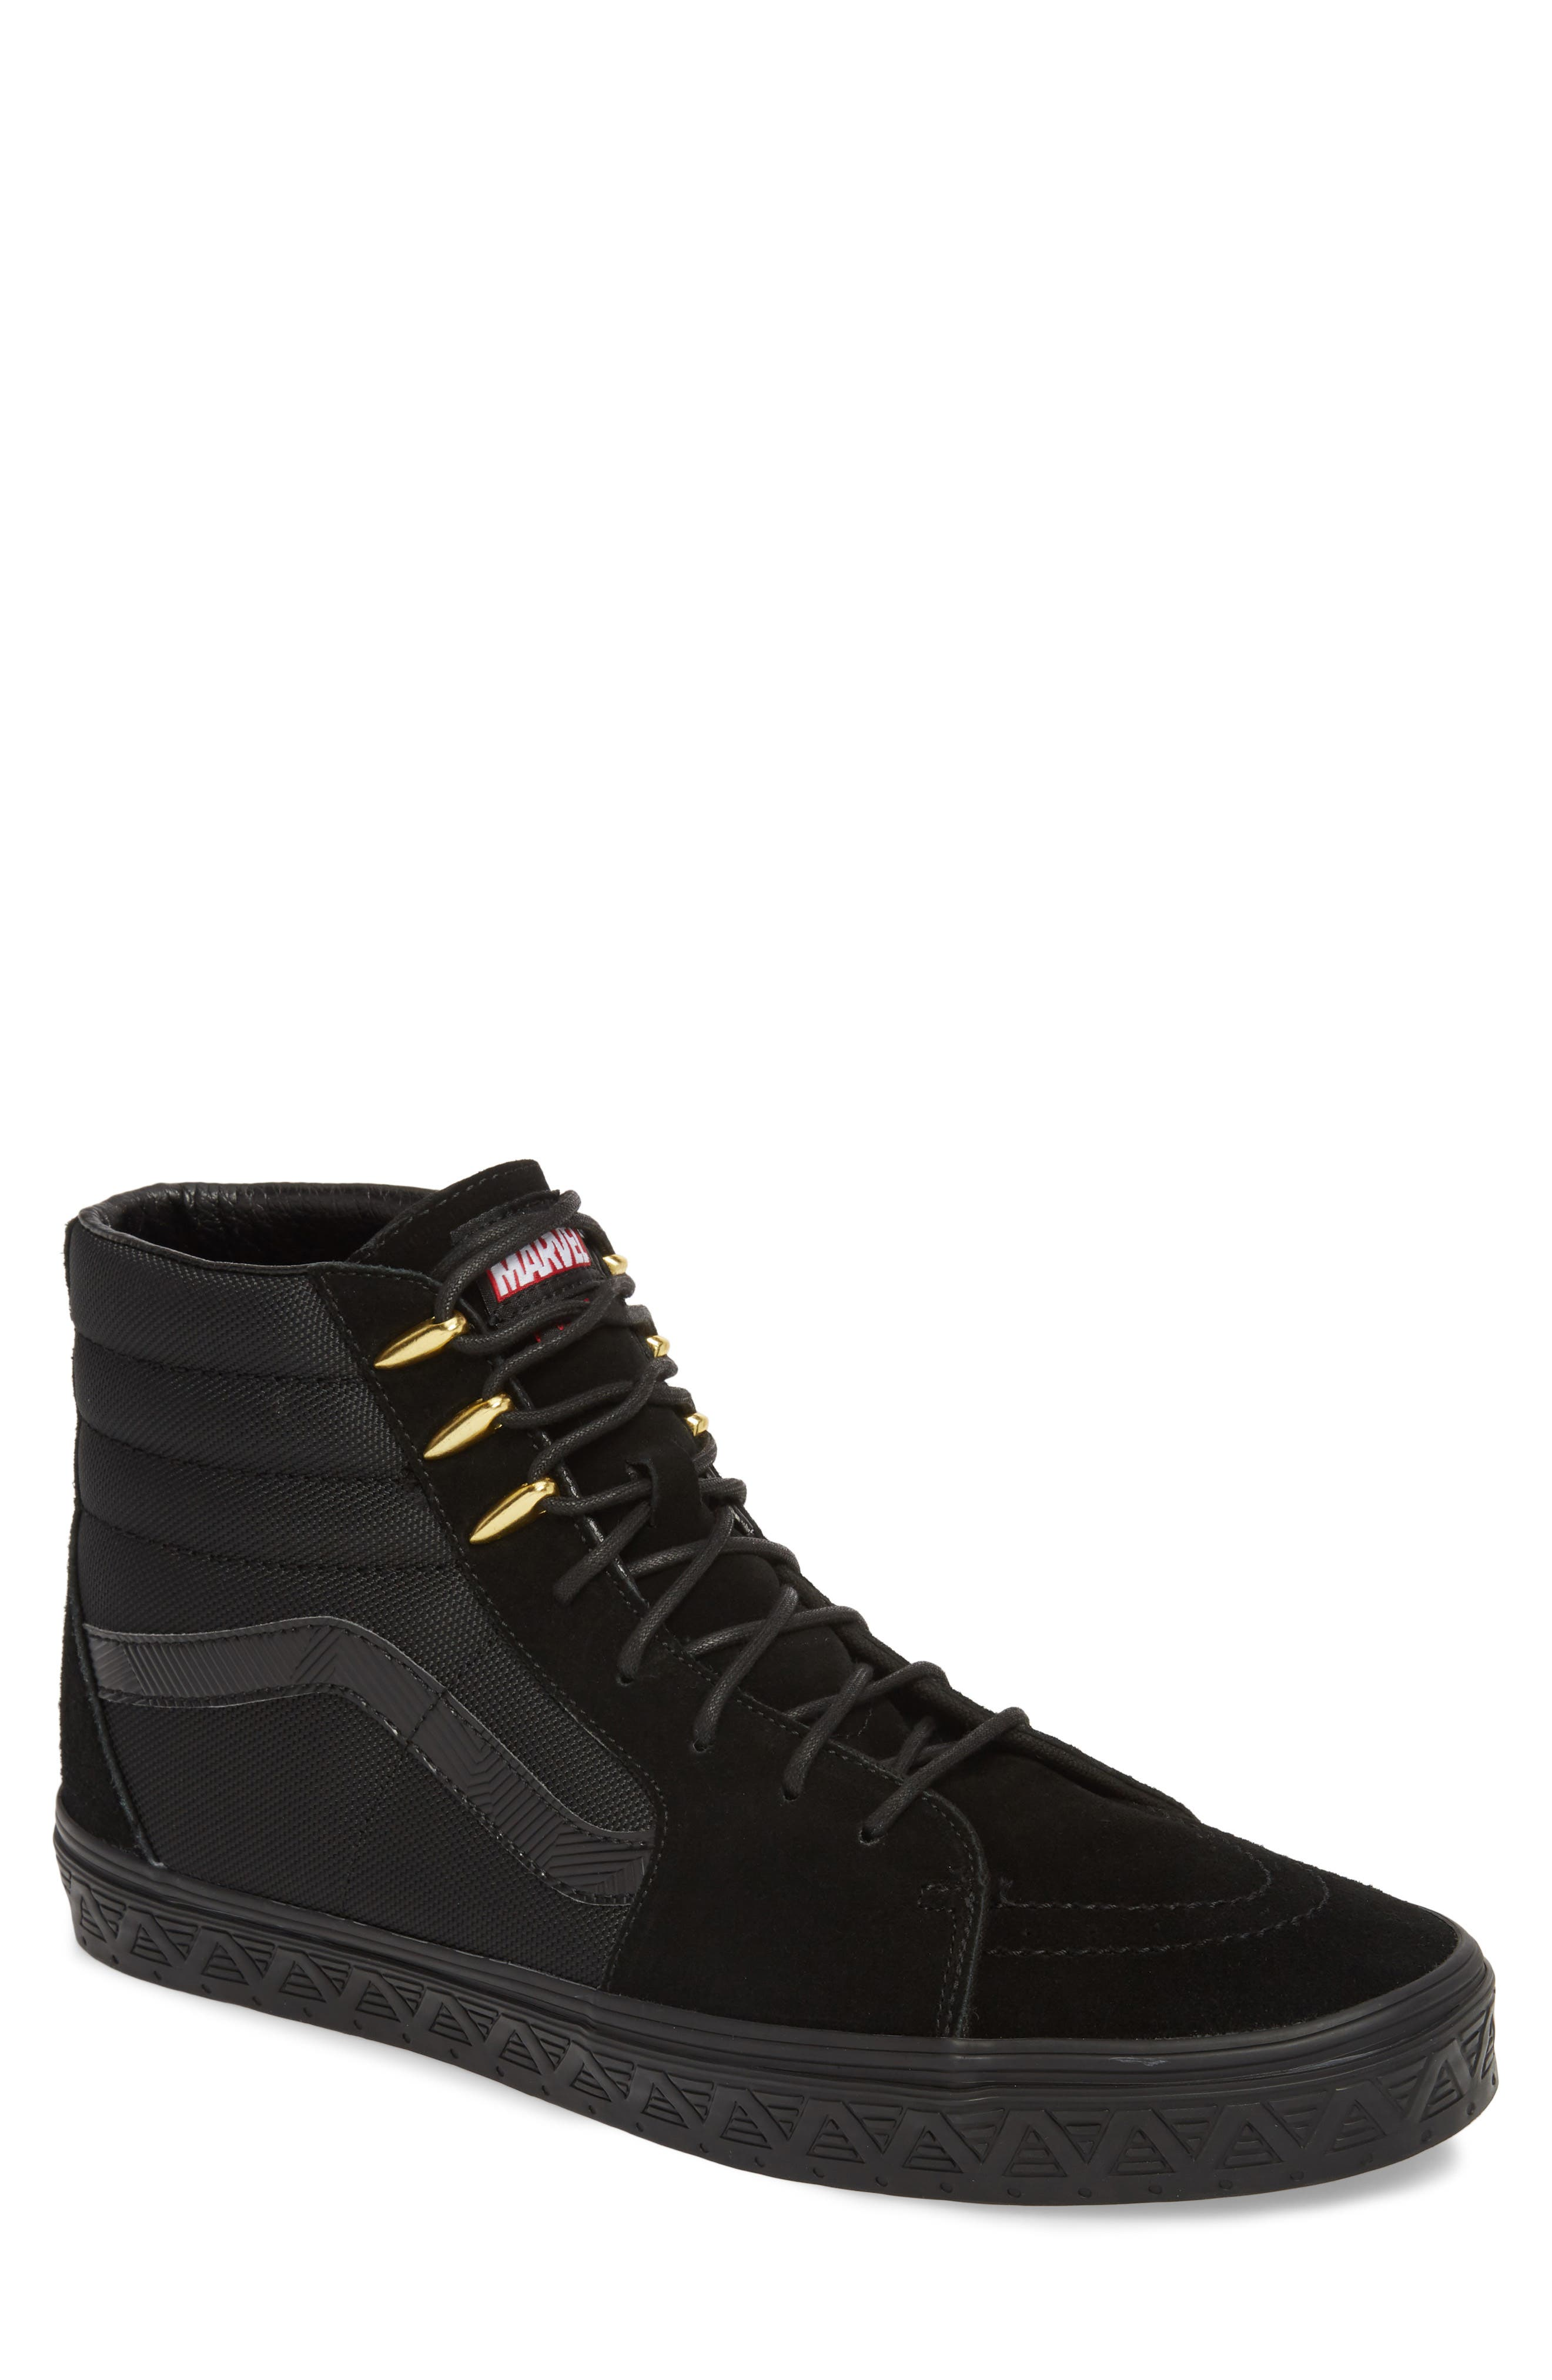 x Marvel<sup>®</sup> UA Sk8-Hi Sneaker,                         Main,                         color,